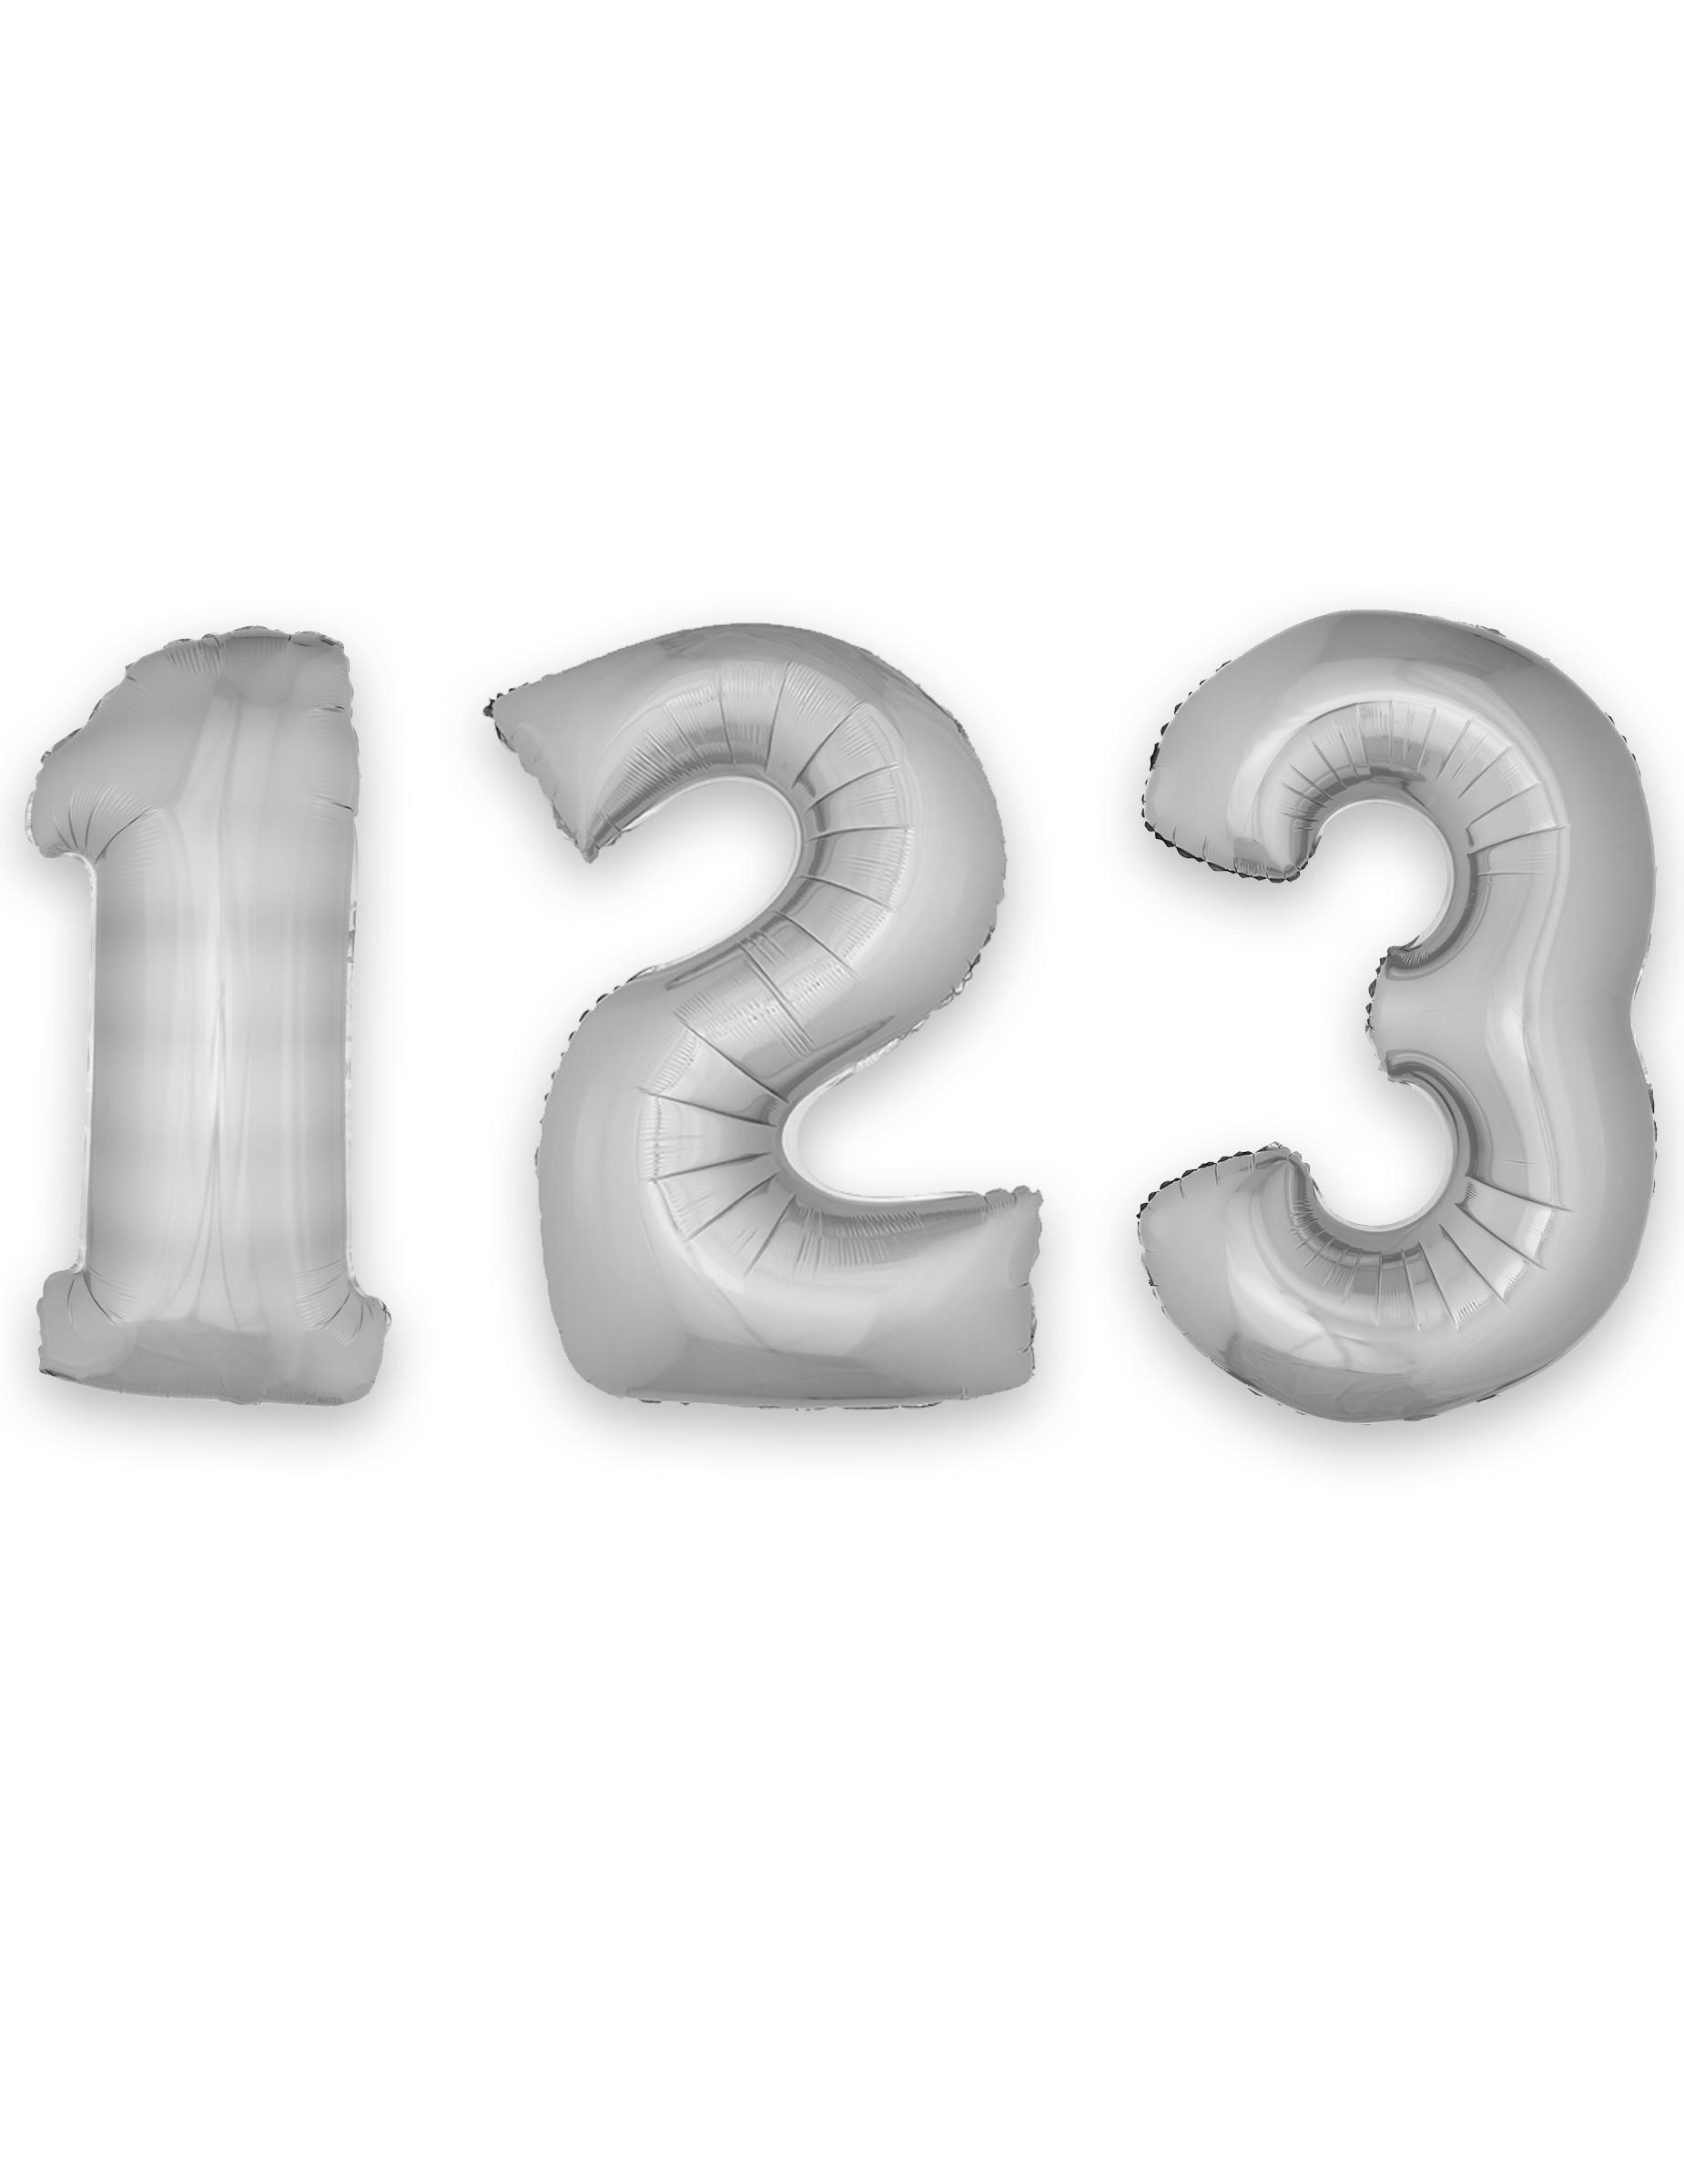 #Folienballon Ziffern Raumdekoration Silber 1m#